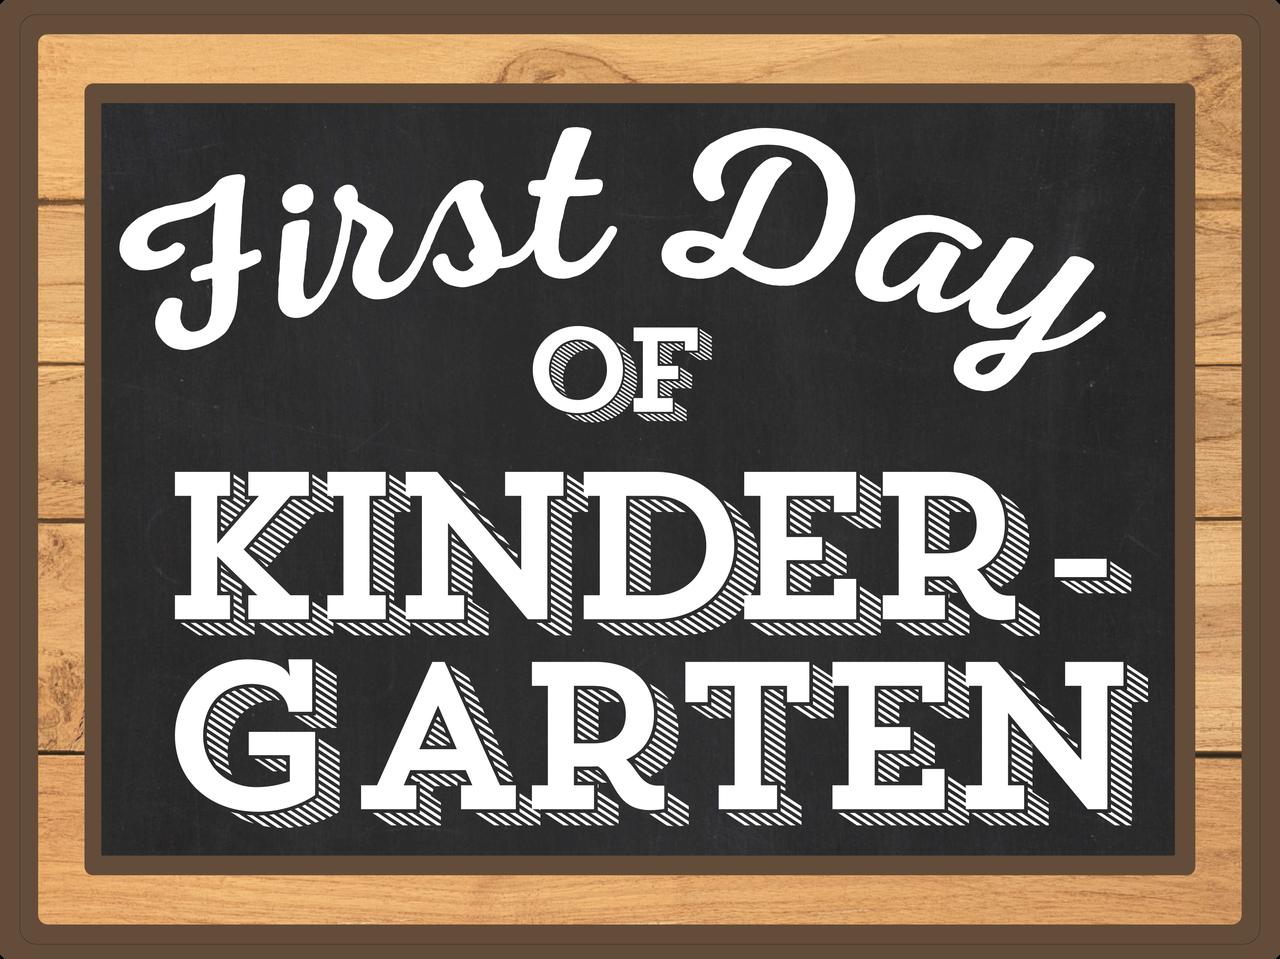 First Day Of Kindergarten Print & Cut File